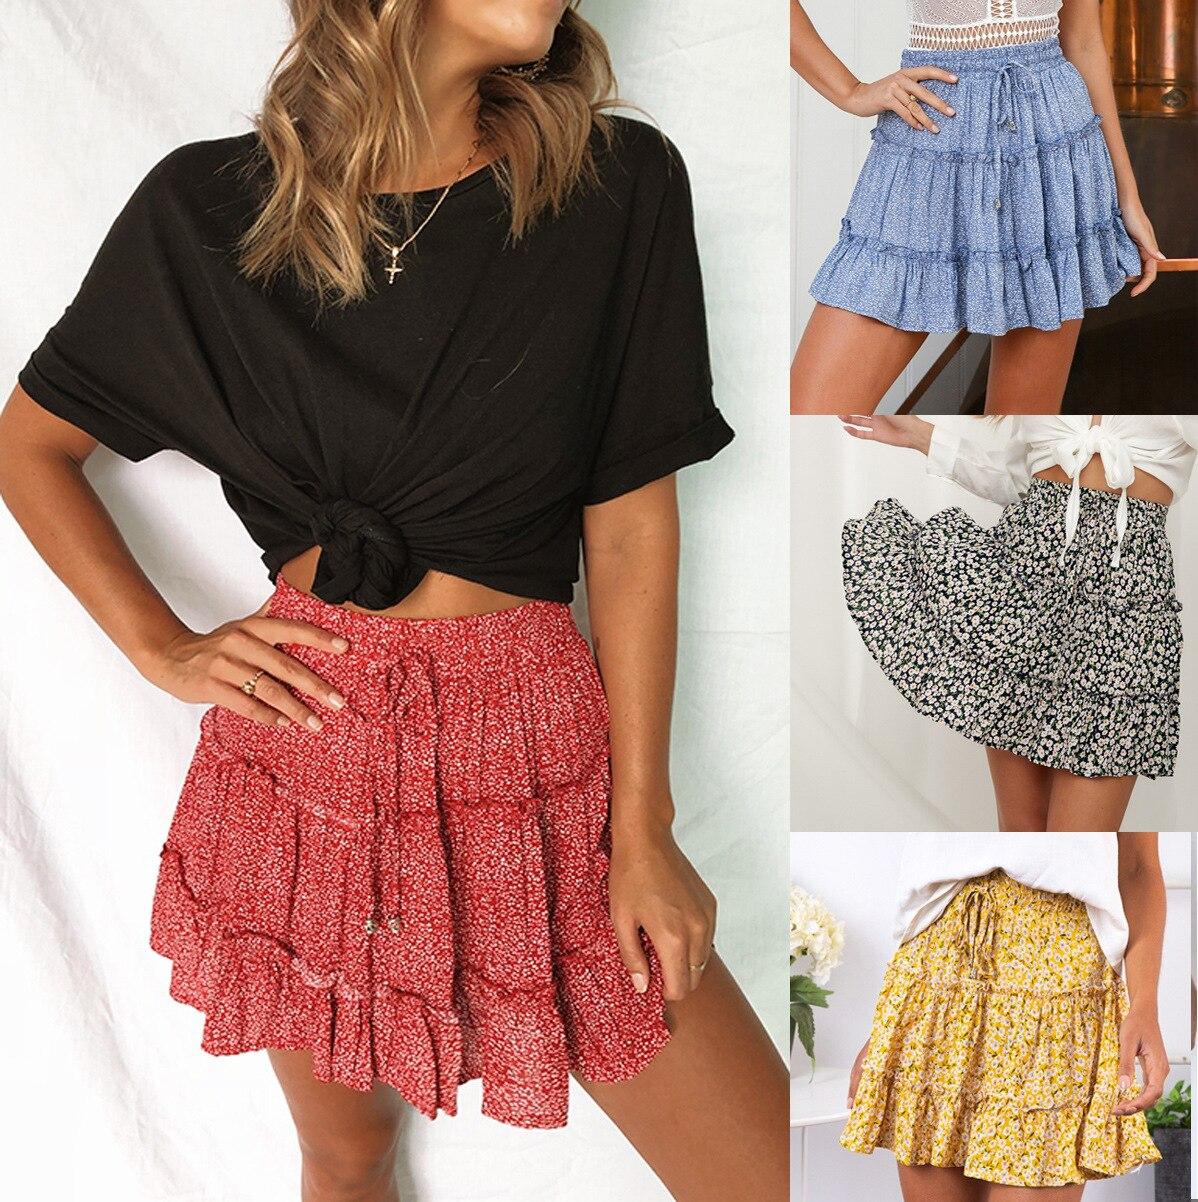 Multi Point Printing Miniskirt Summer Ruffle High Waist Skirt Women's Street Style Slim European and